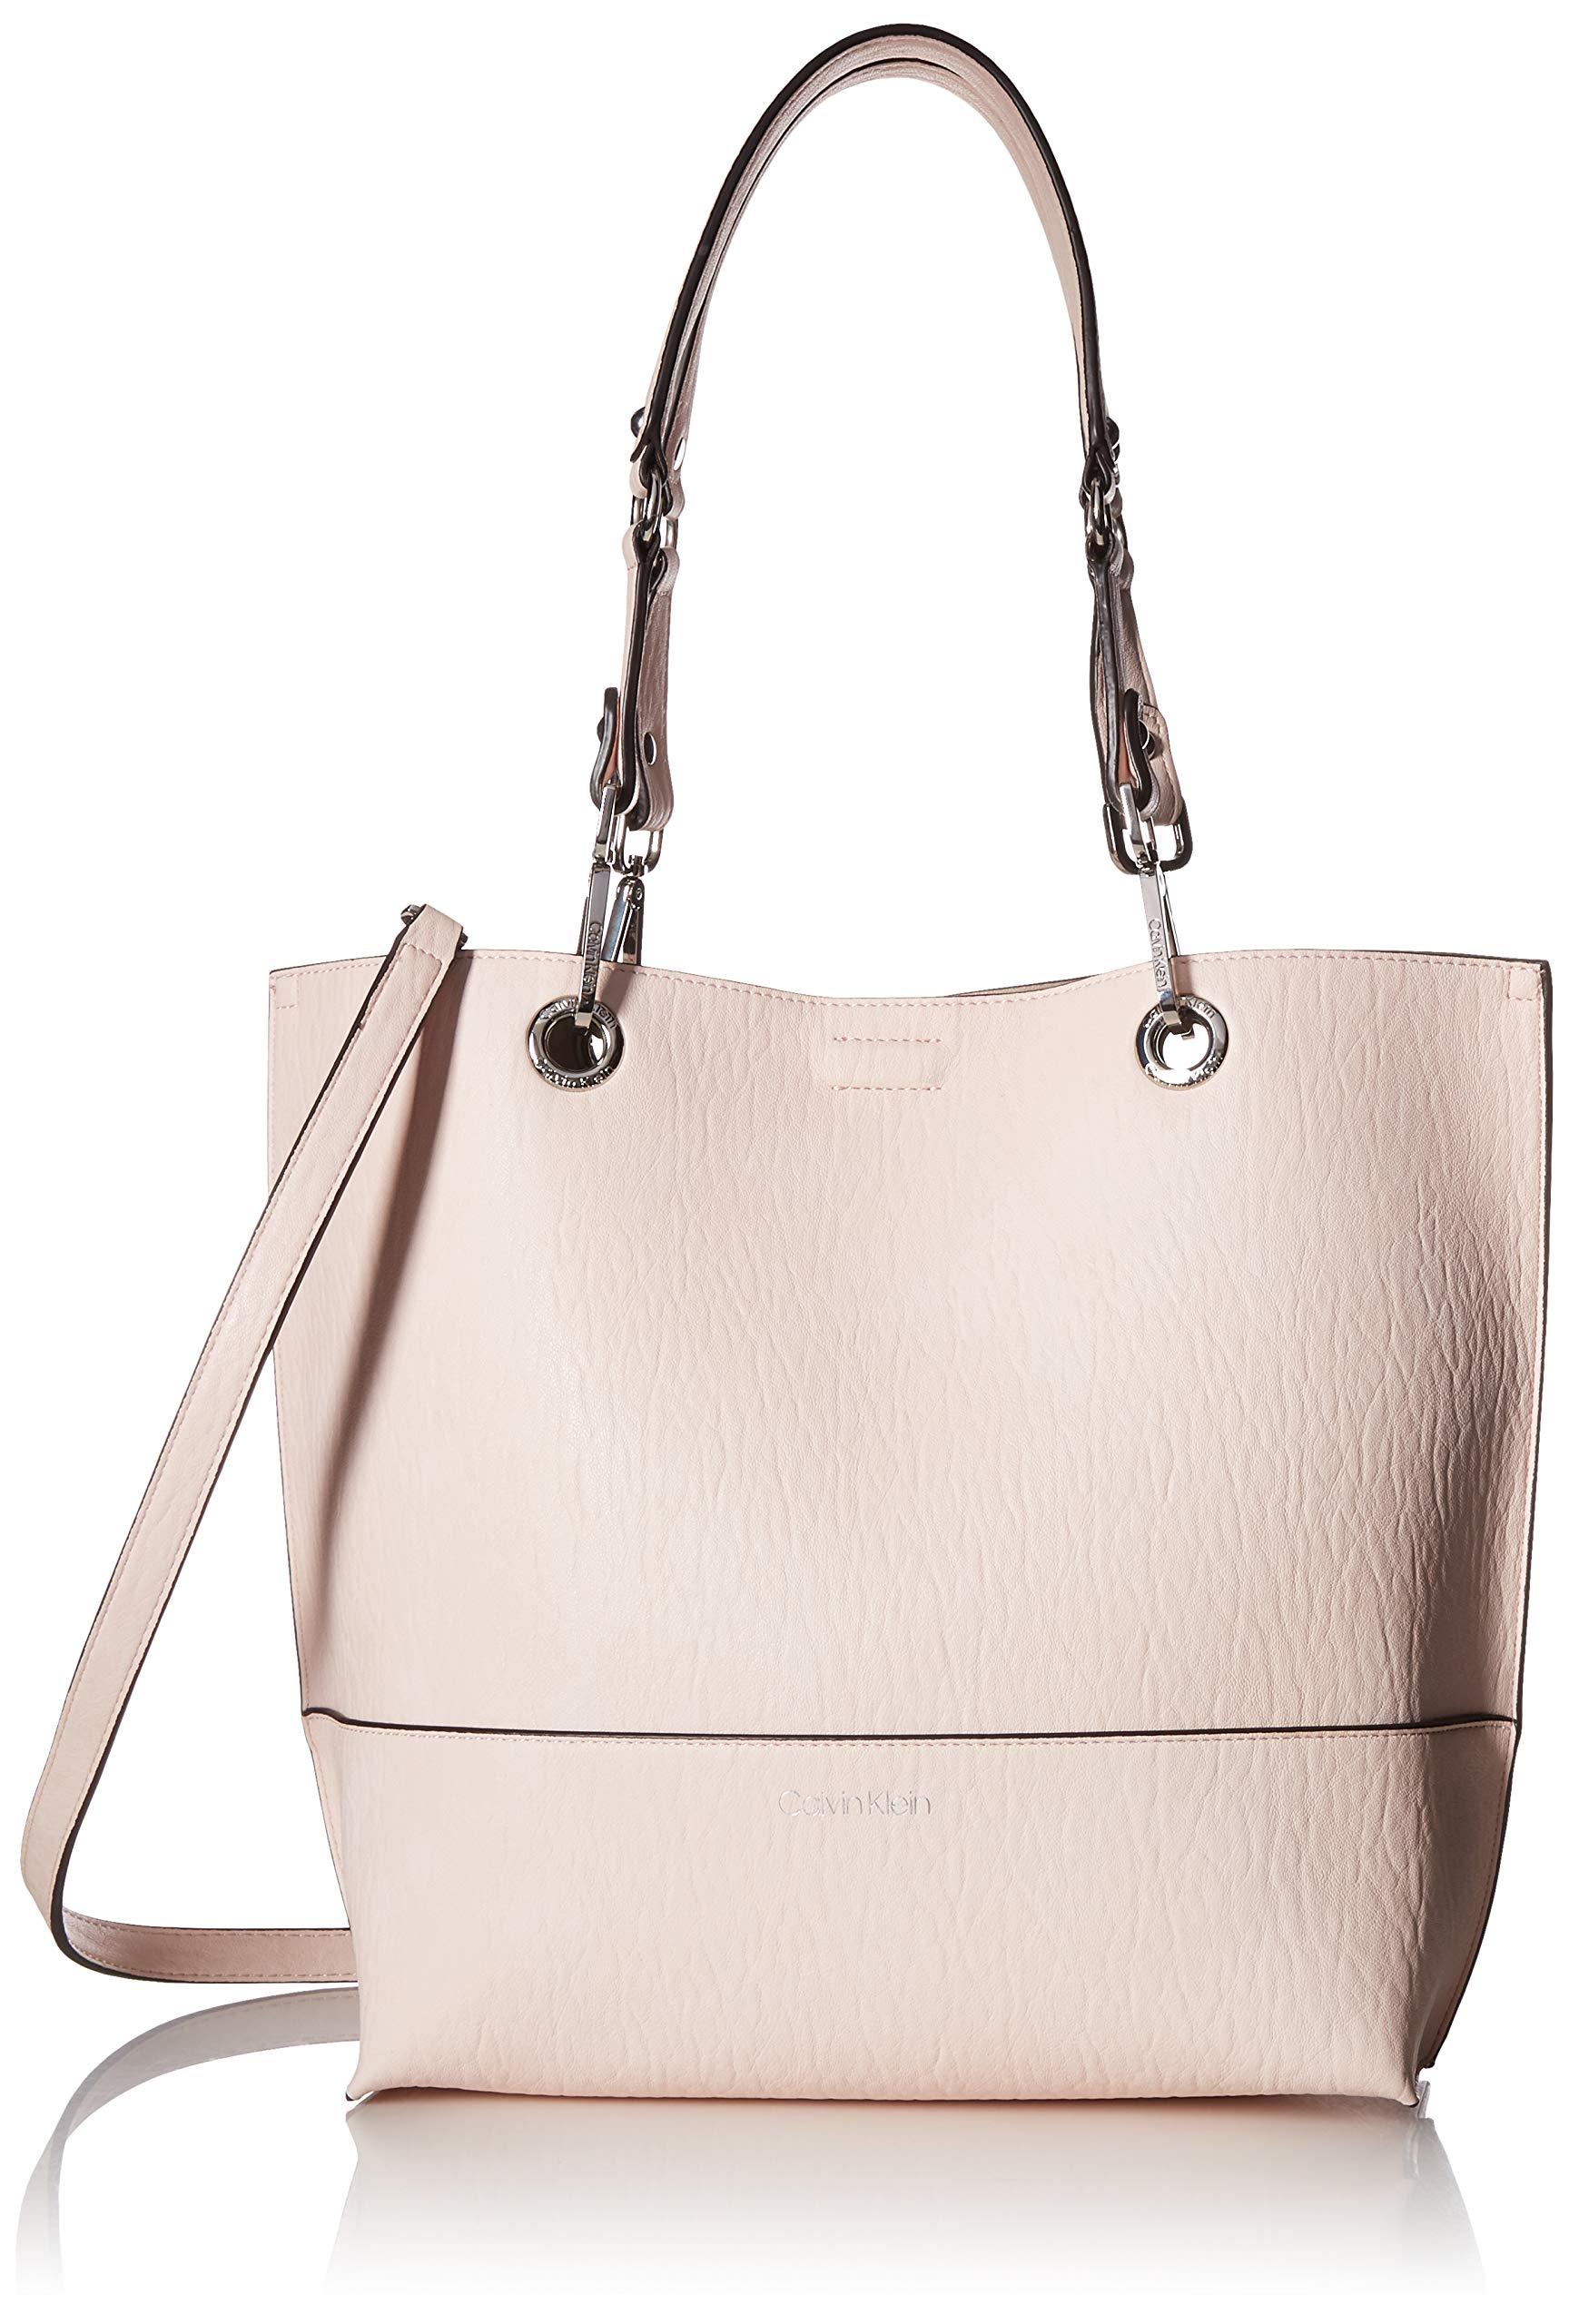 Calvin Klein Reversible Novelty Key Item N/s Tote, Powder Pink